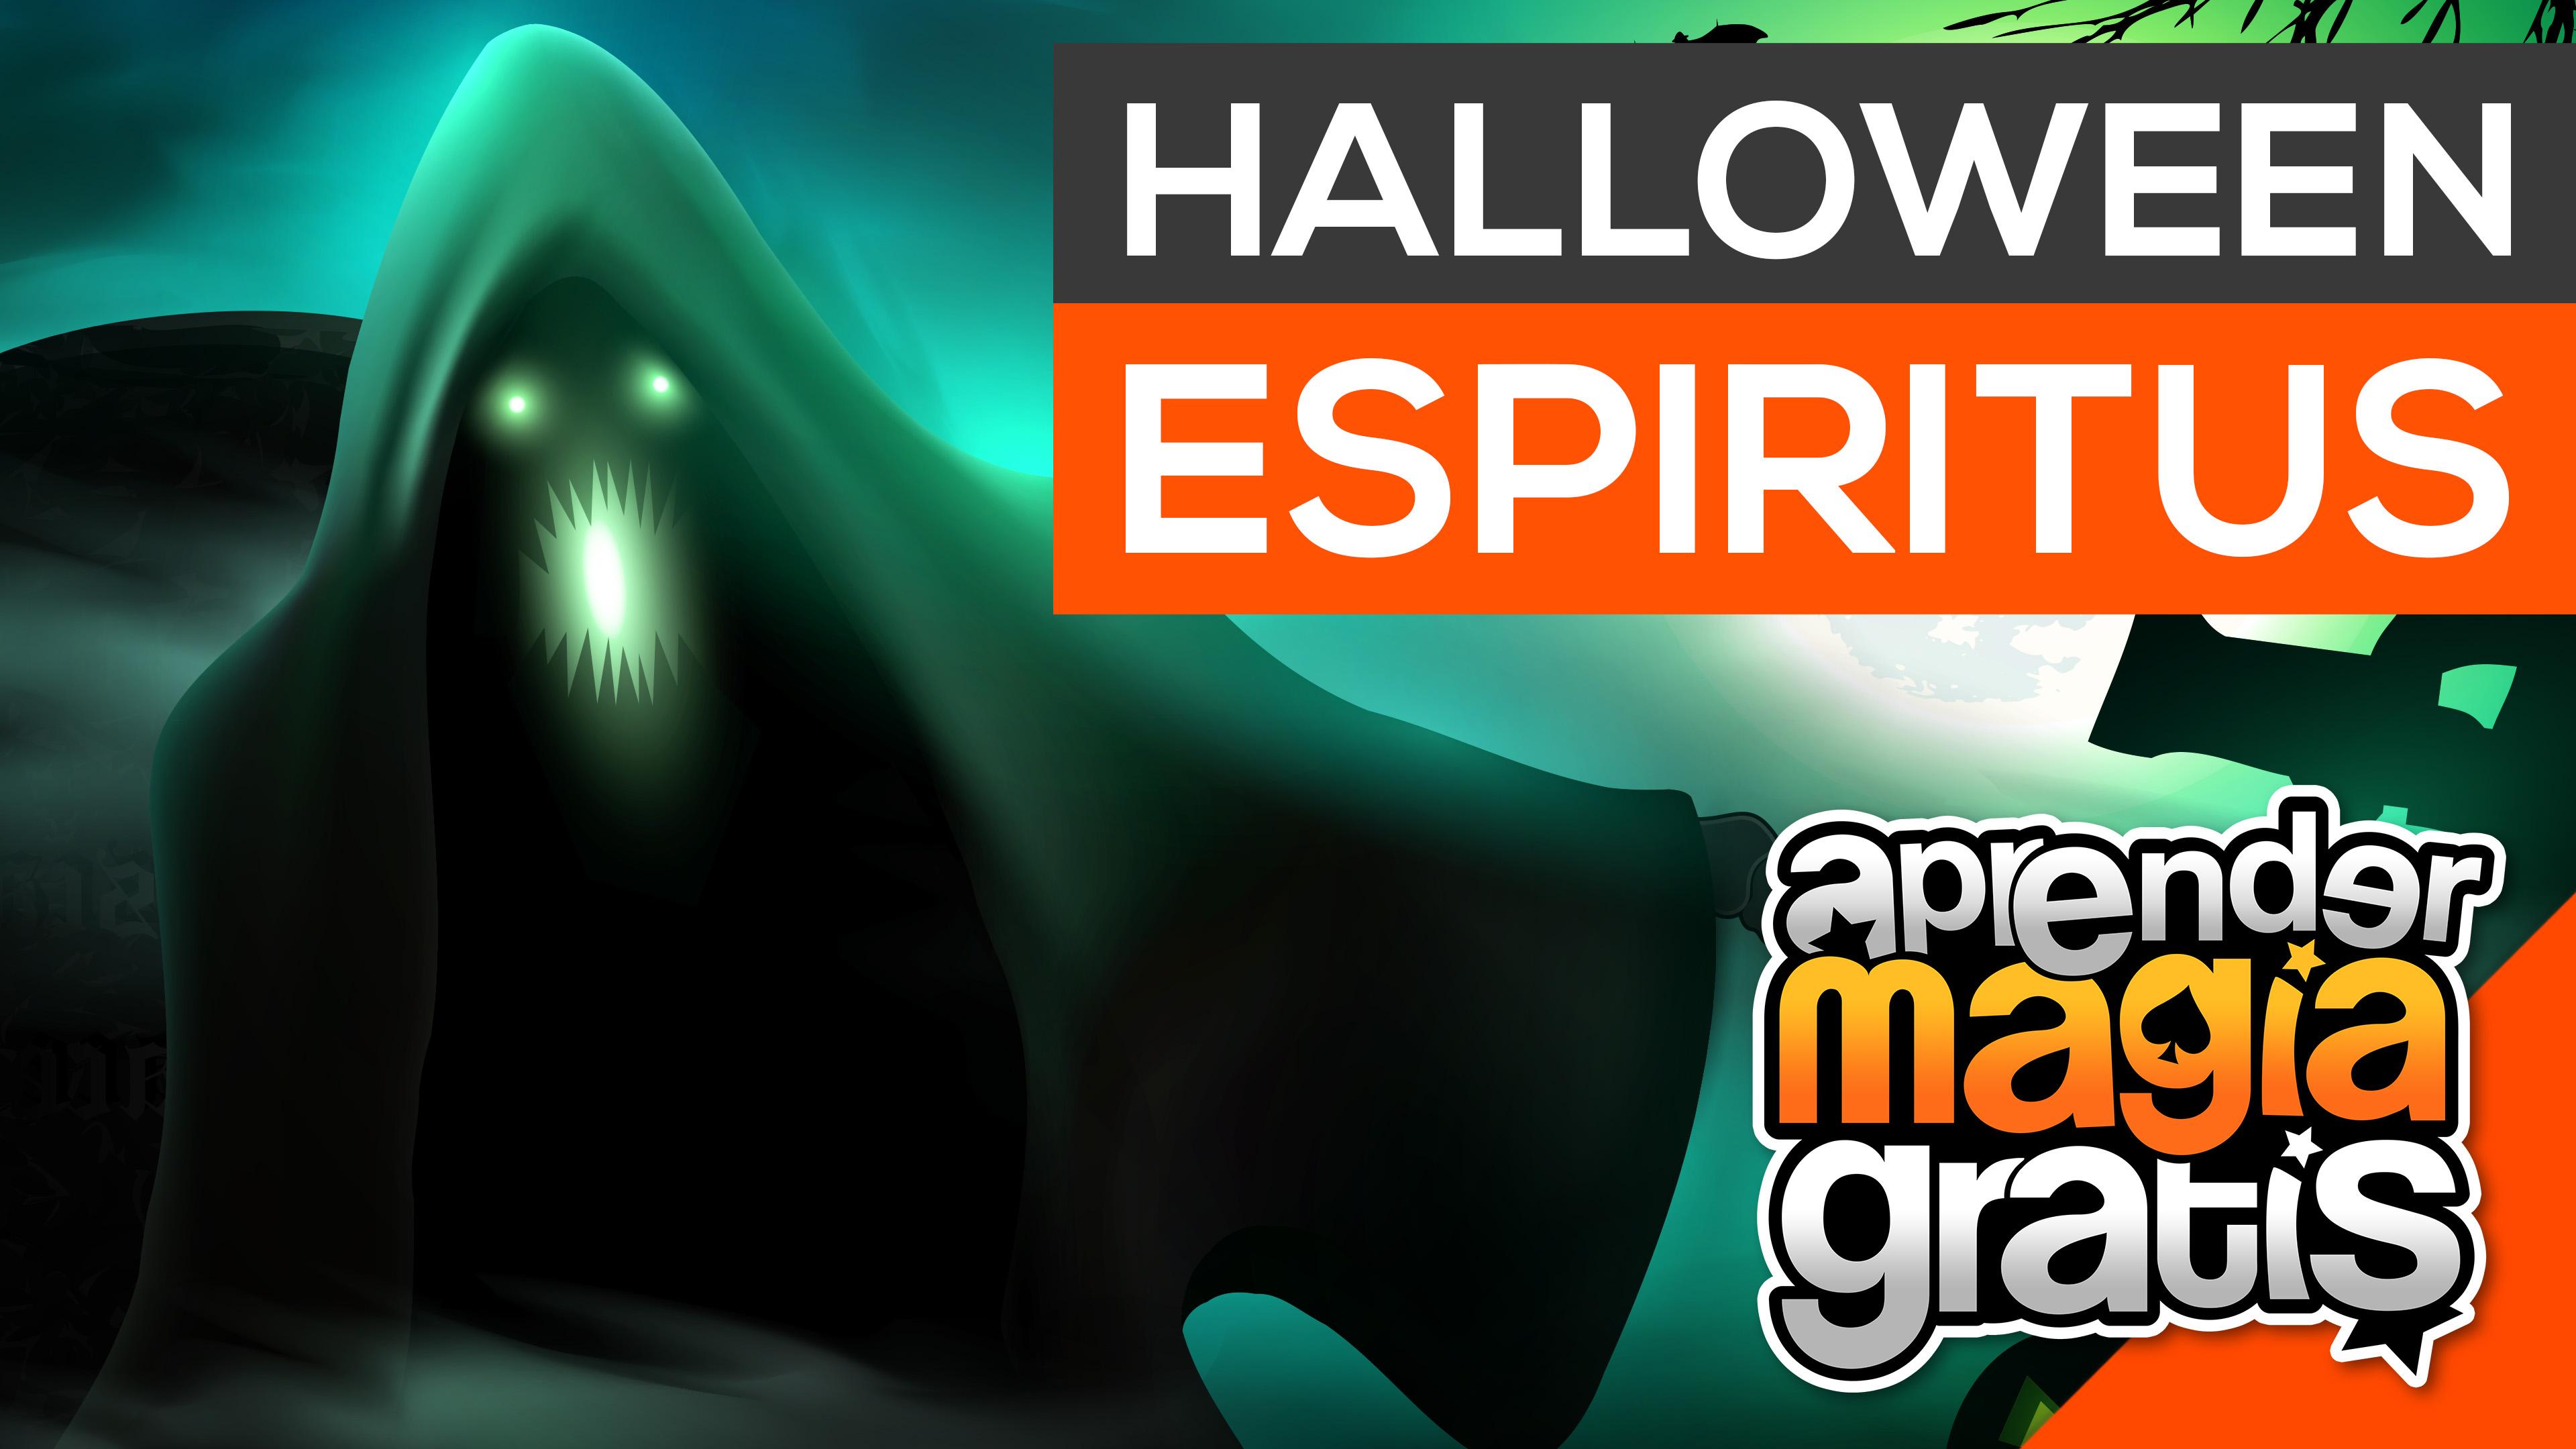 Trucos de magia para halloween contactar con fantasmas y espiritus